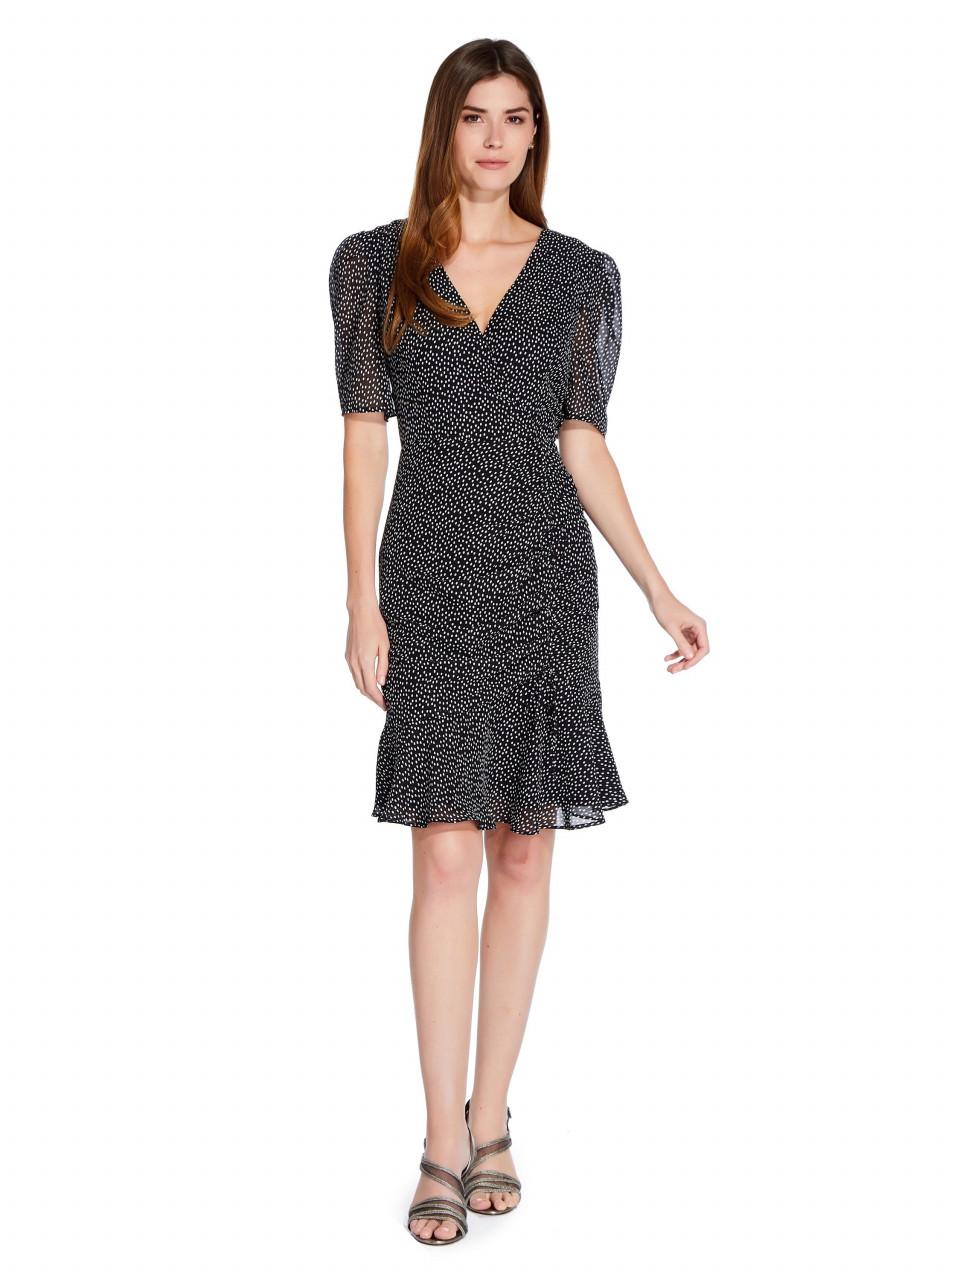 Darling dot shirred dress